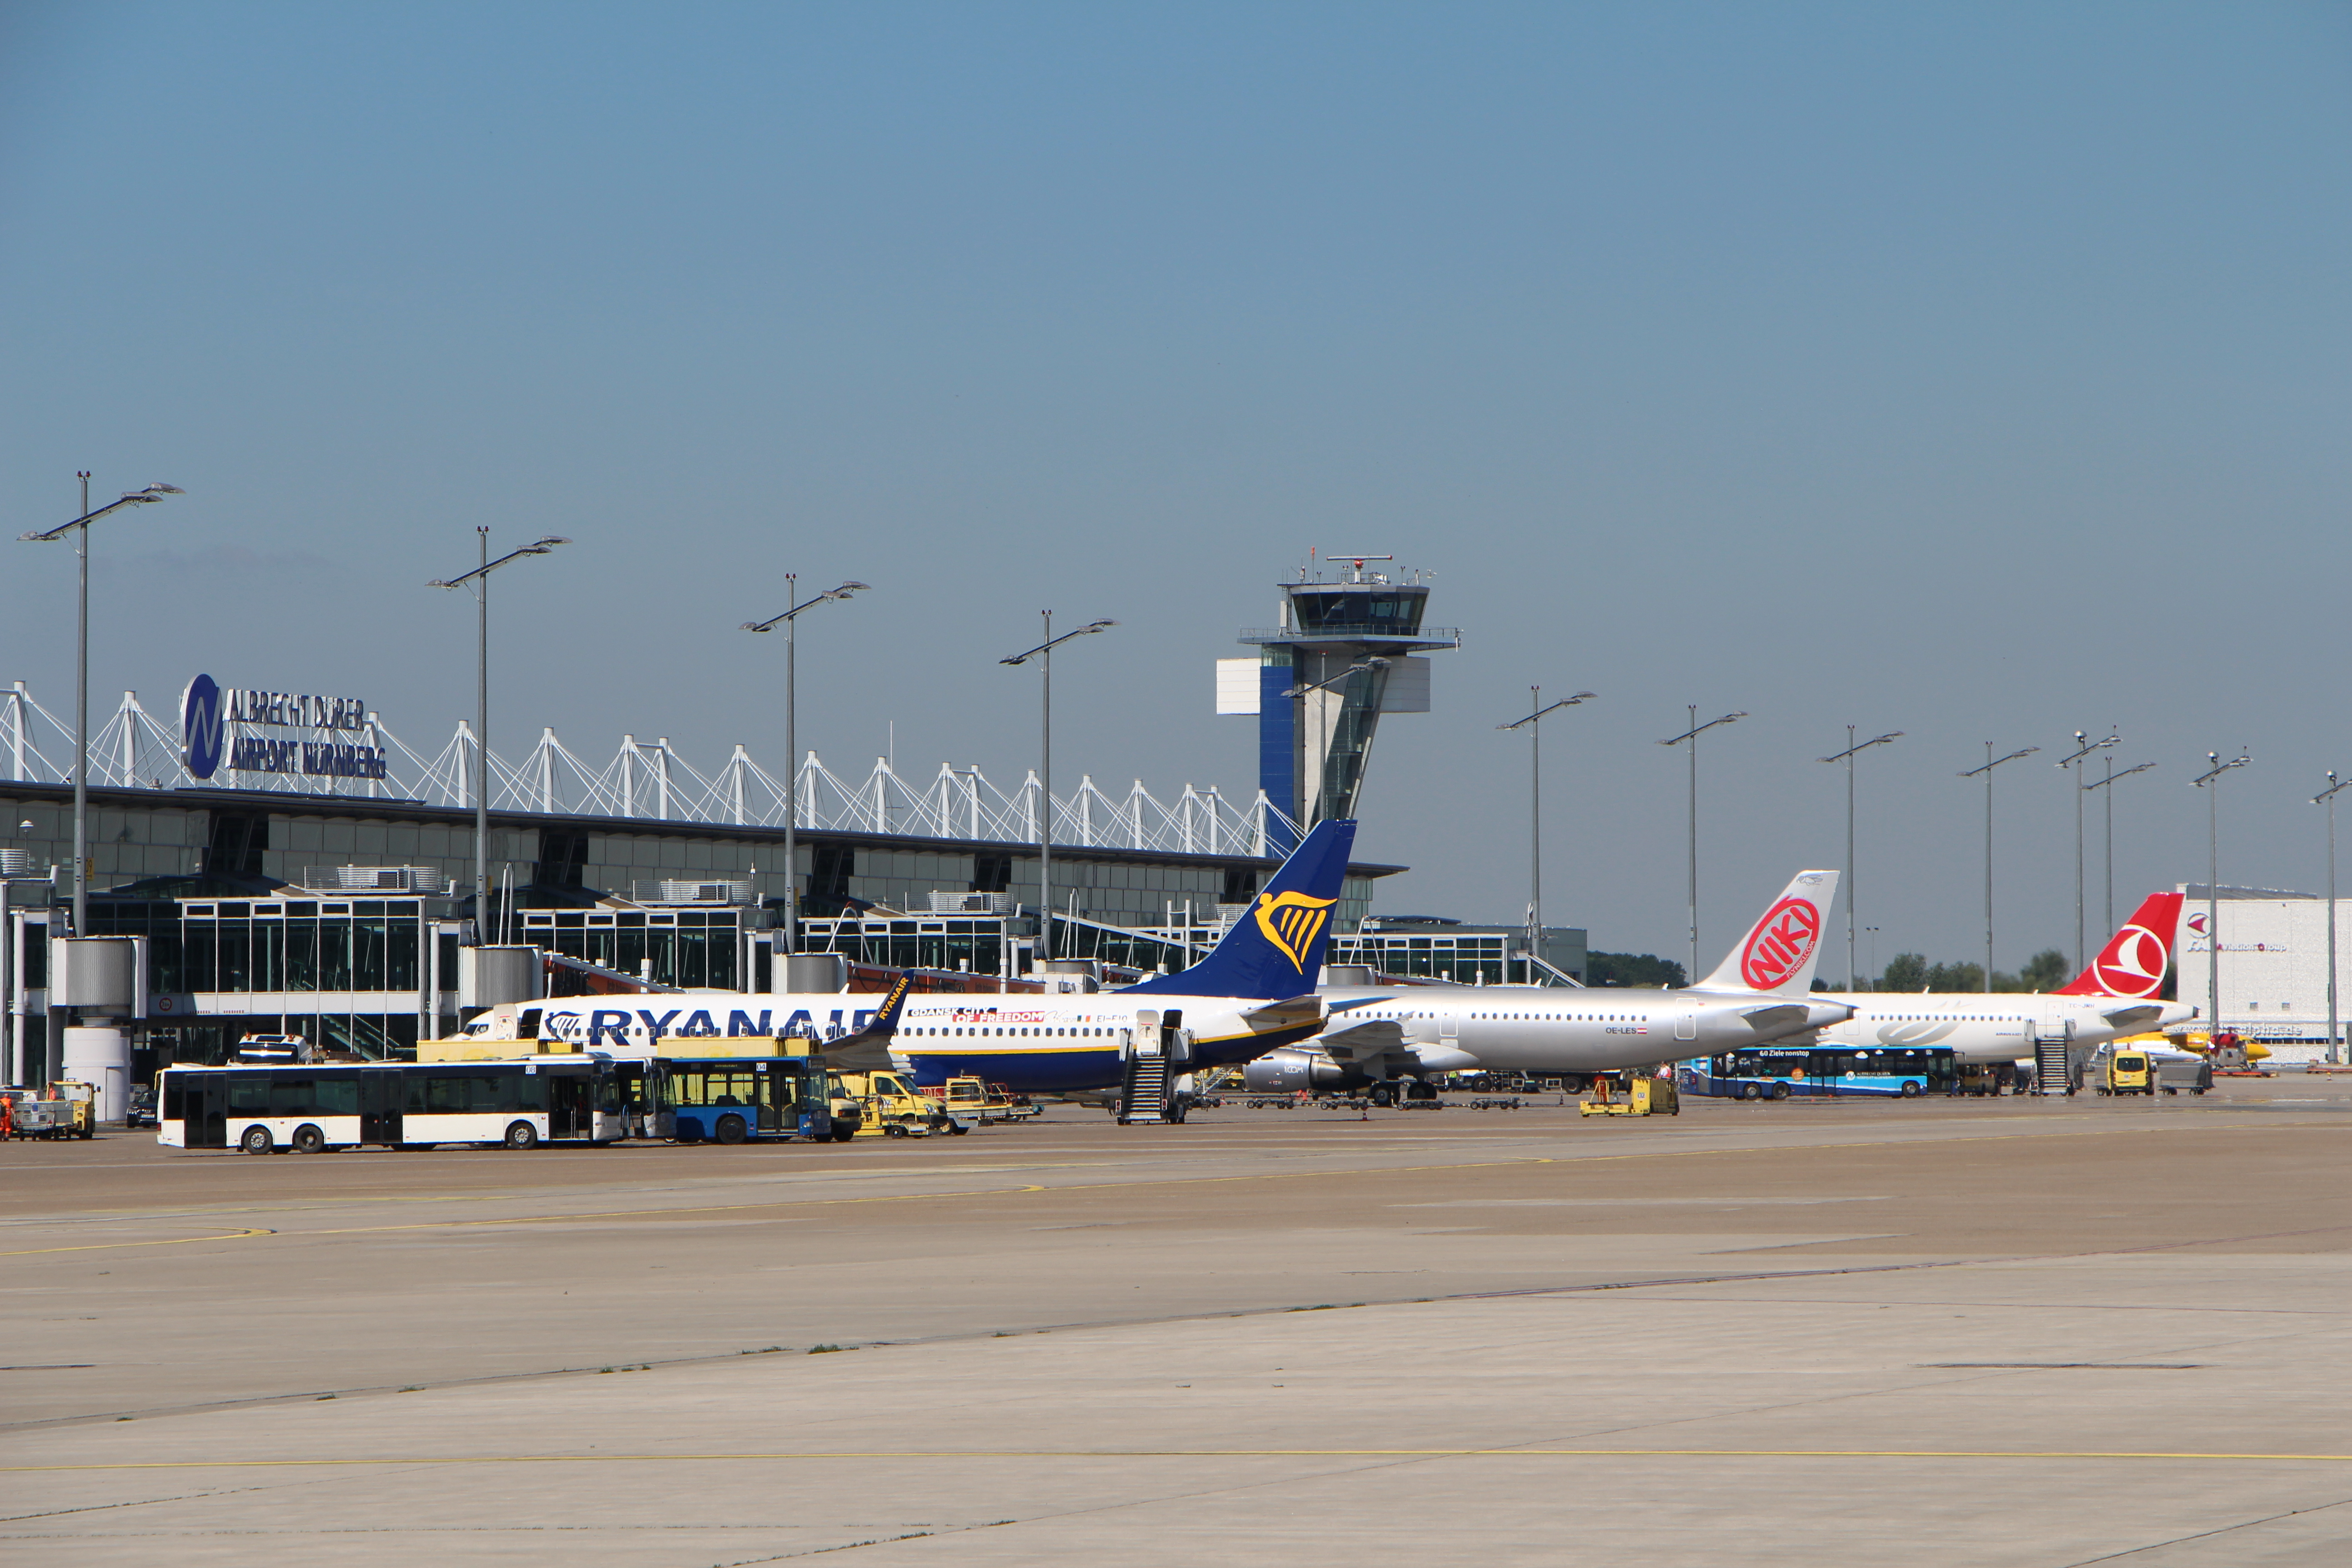 Hauptsaison am Airport Nürnberg: Über 600.000 Fluggäste erwartet